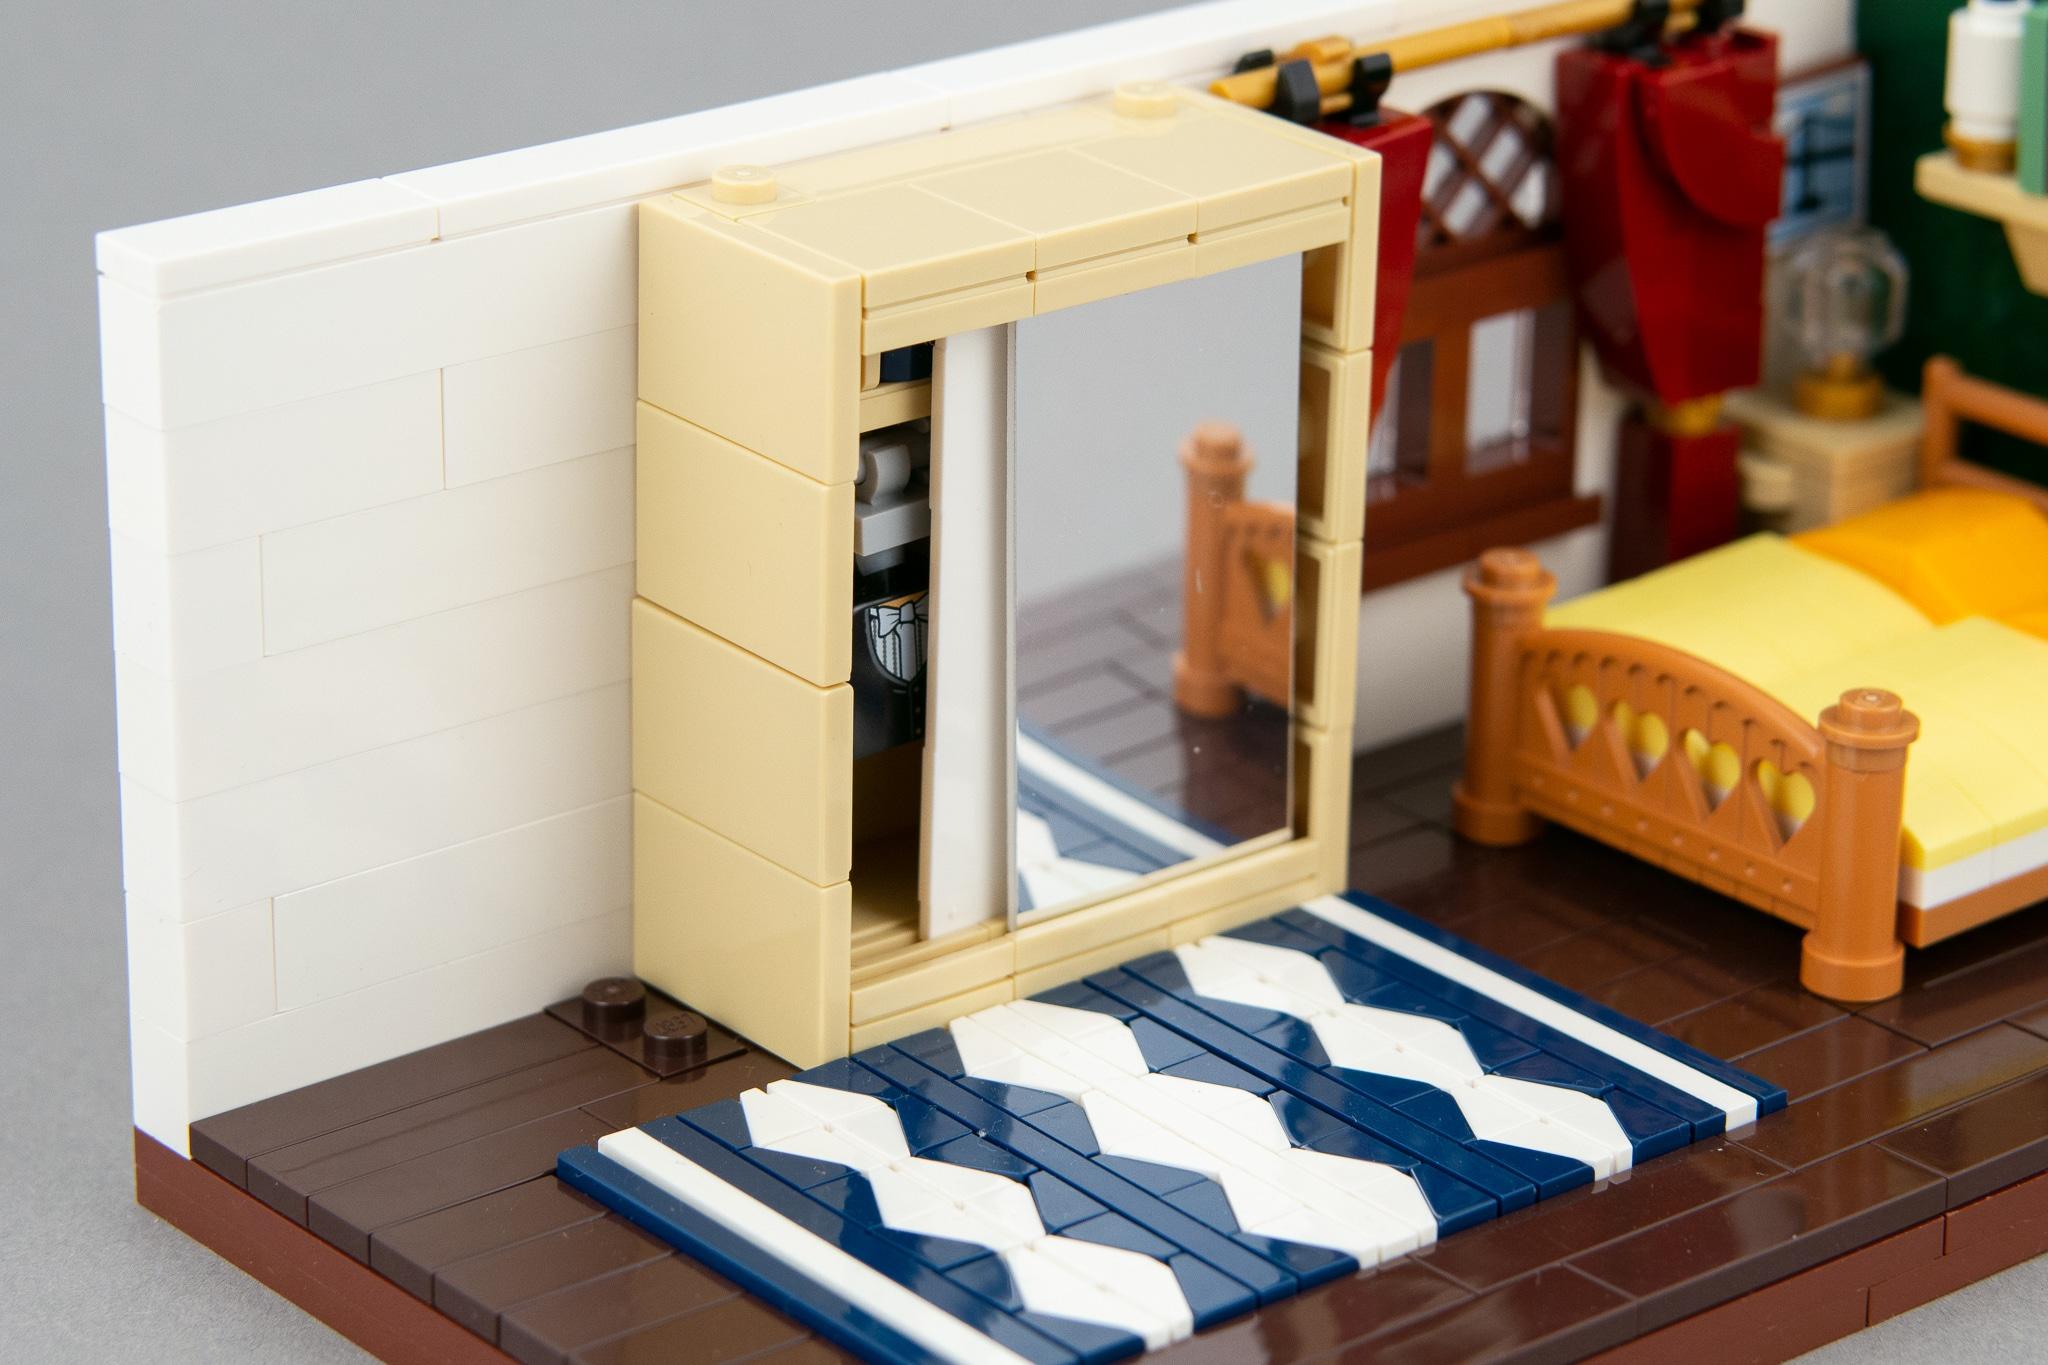 LEGO Schlafzimmer Moc (12)